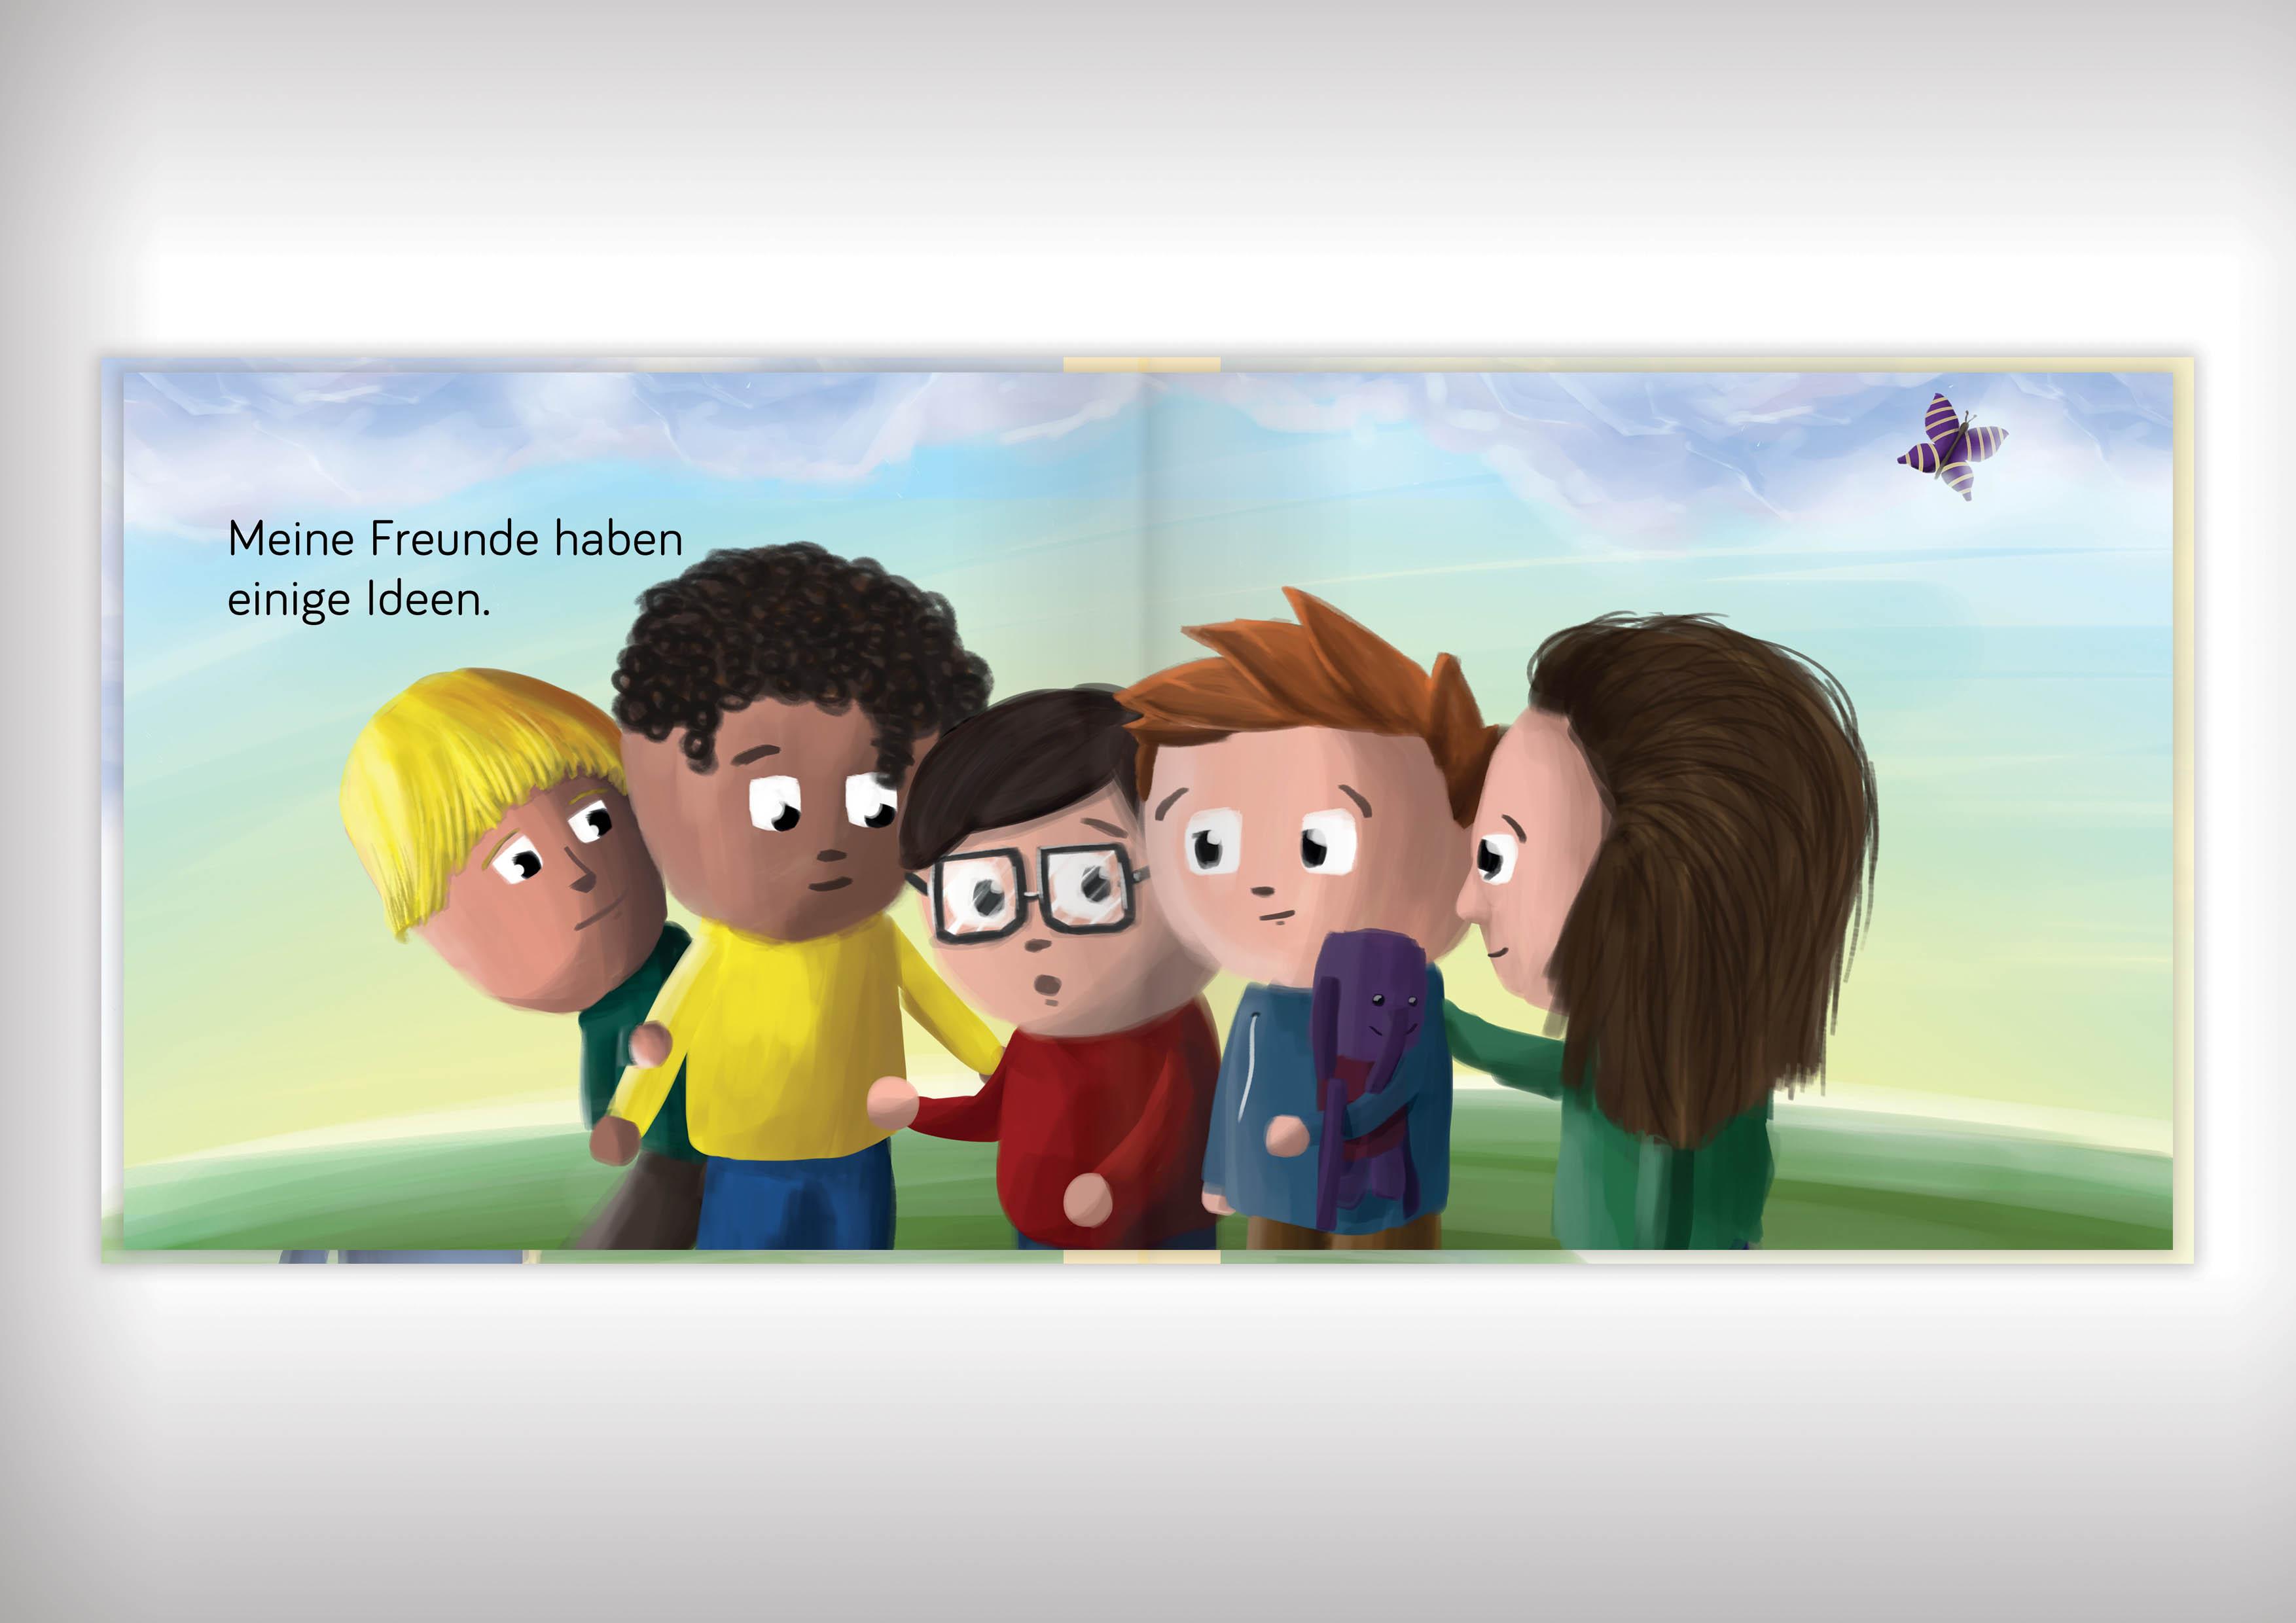 Kinderbuch_Mockup_01 MERGED_0010_Seite_25